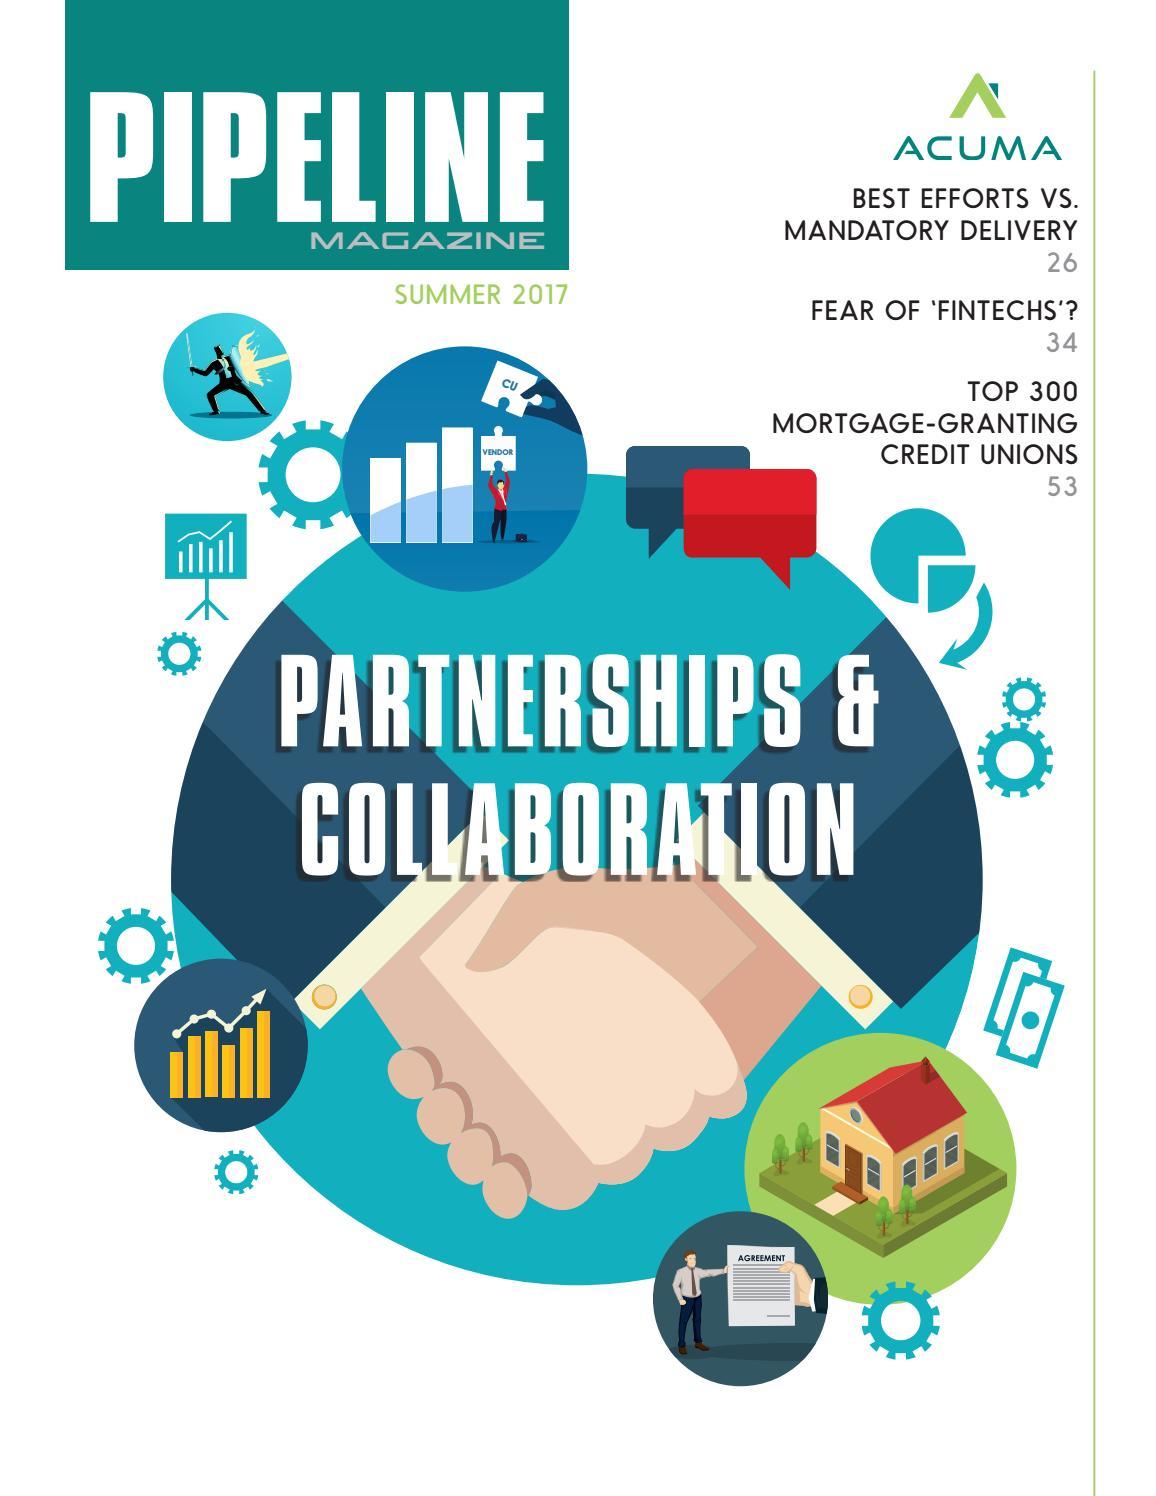 Pipeline Magazine Summer 2017 By Acuma Issuu